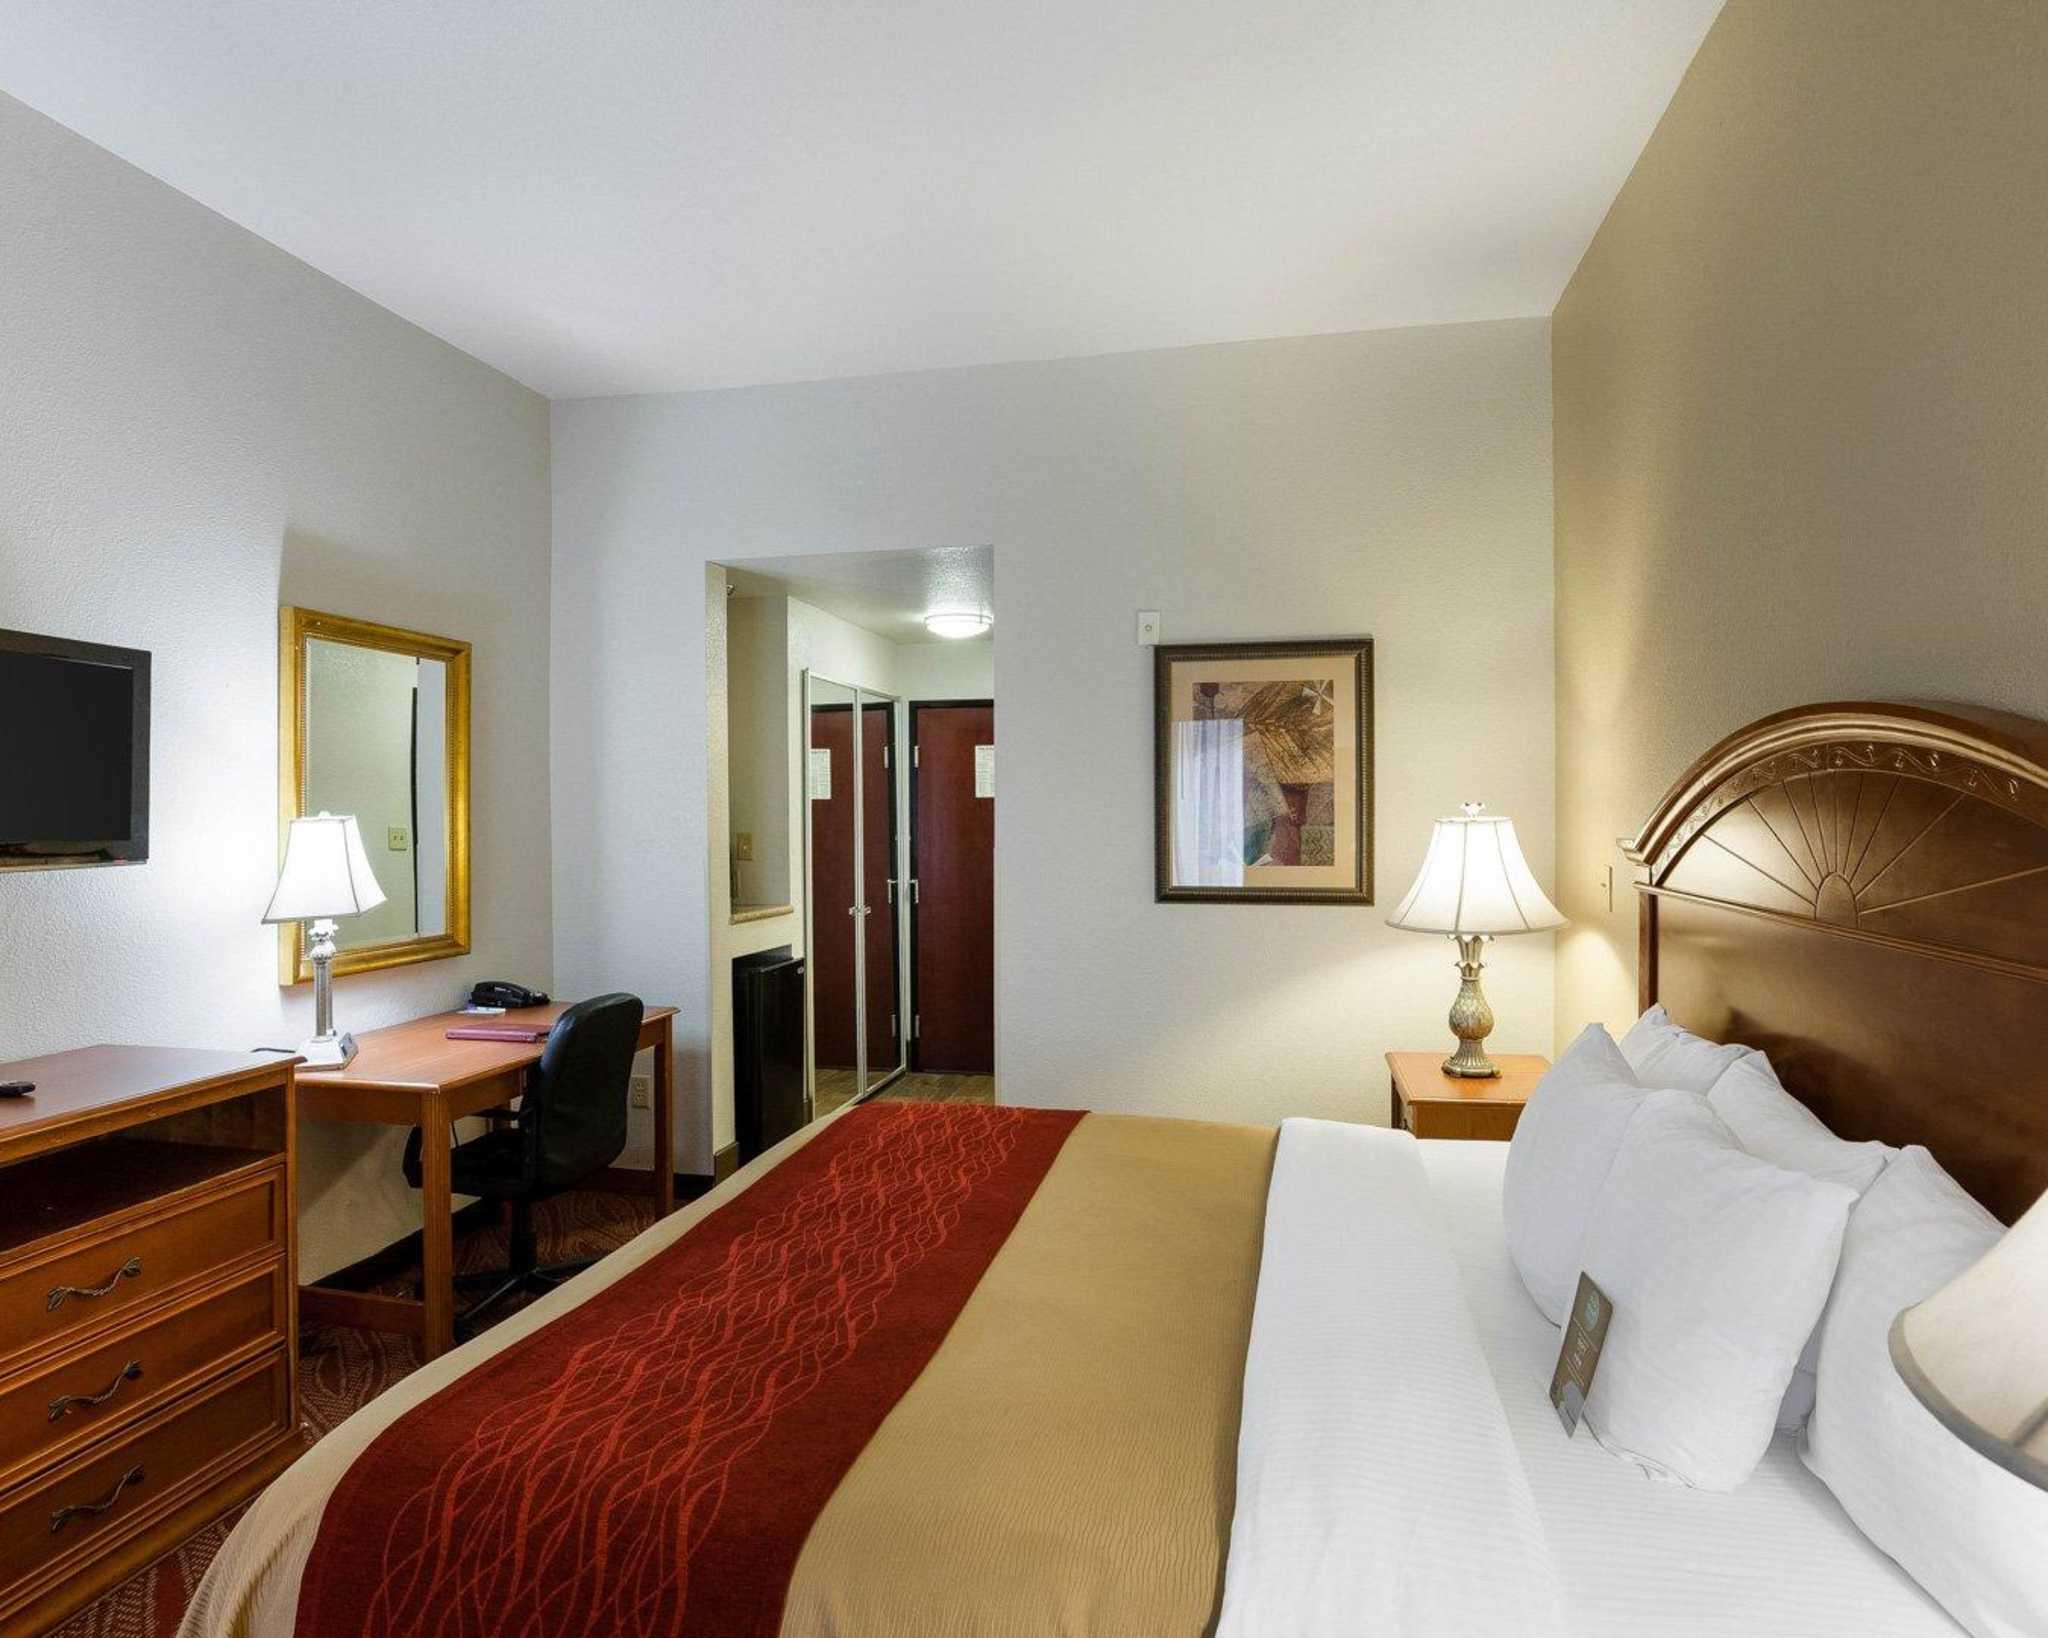 Comfort Inn & Suites Near Medical Center image 22